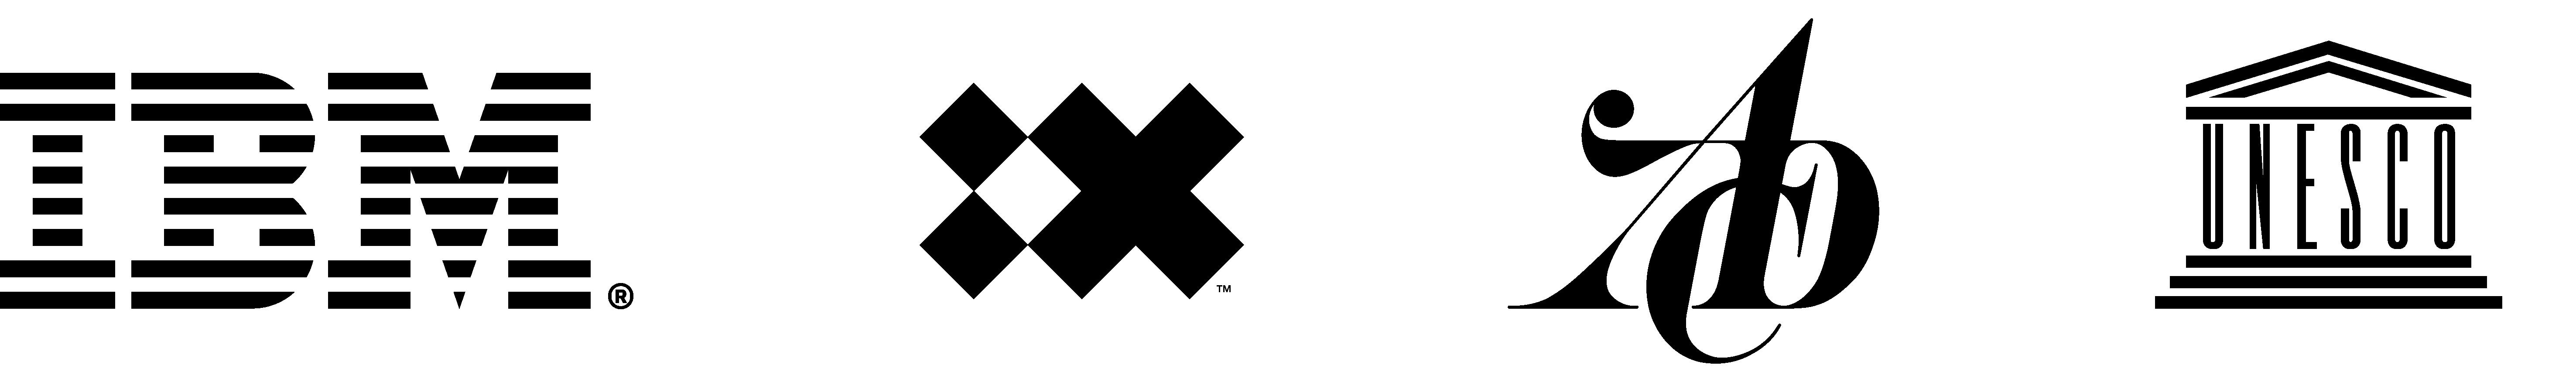 ingmarkoglin-de_logos@3x